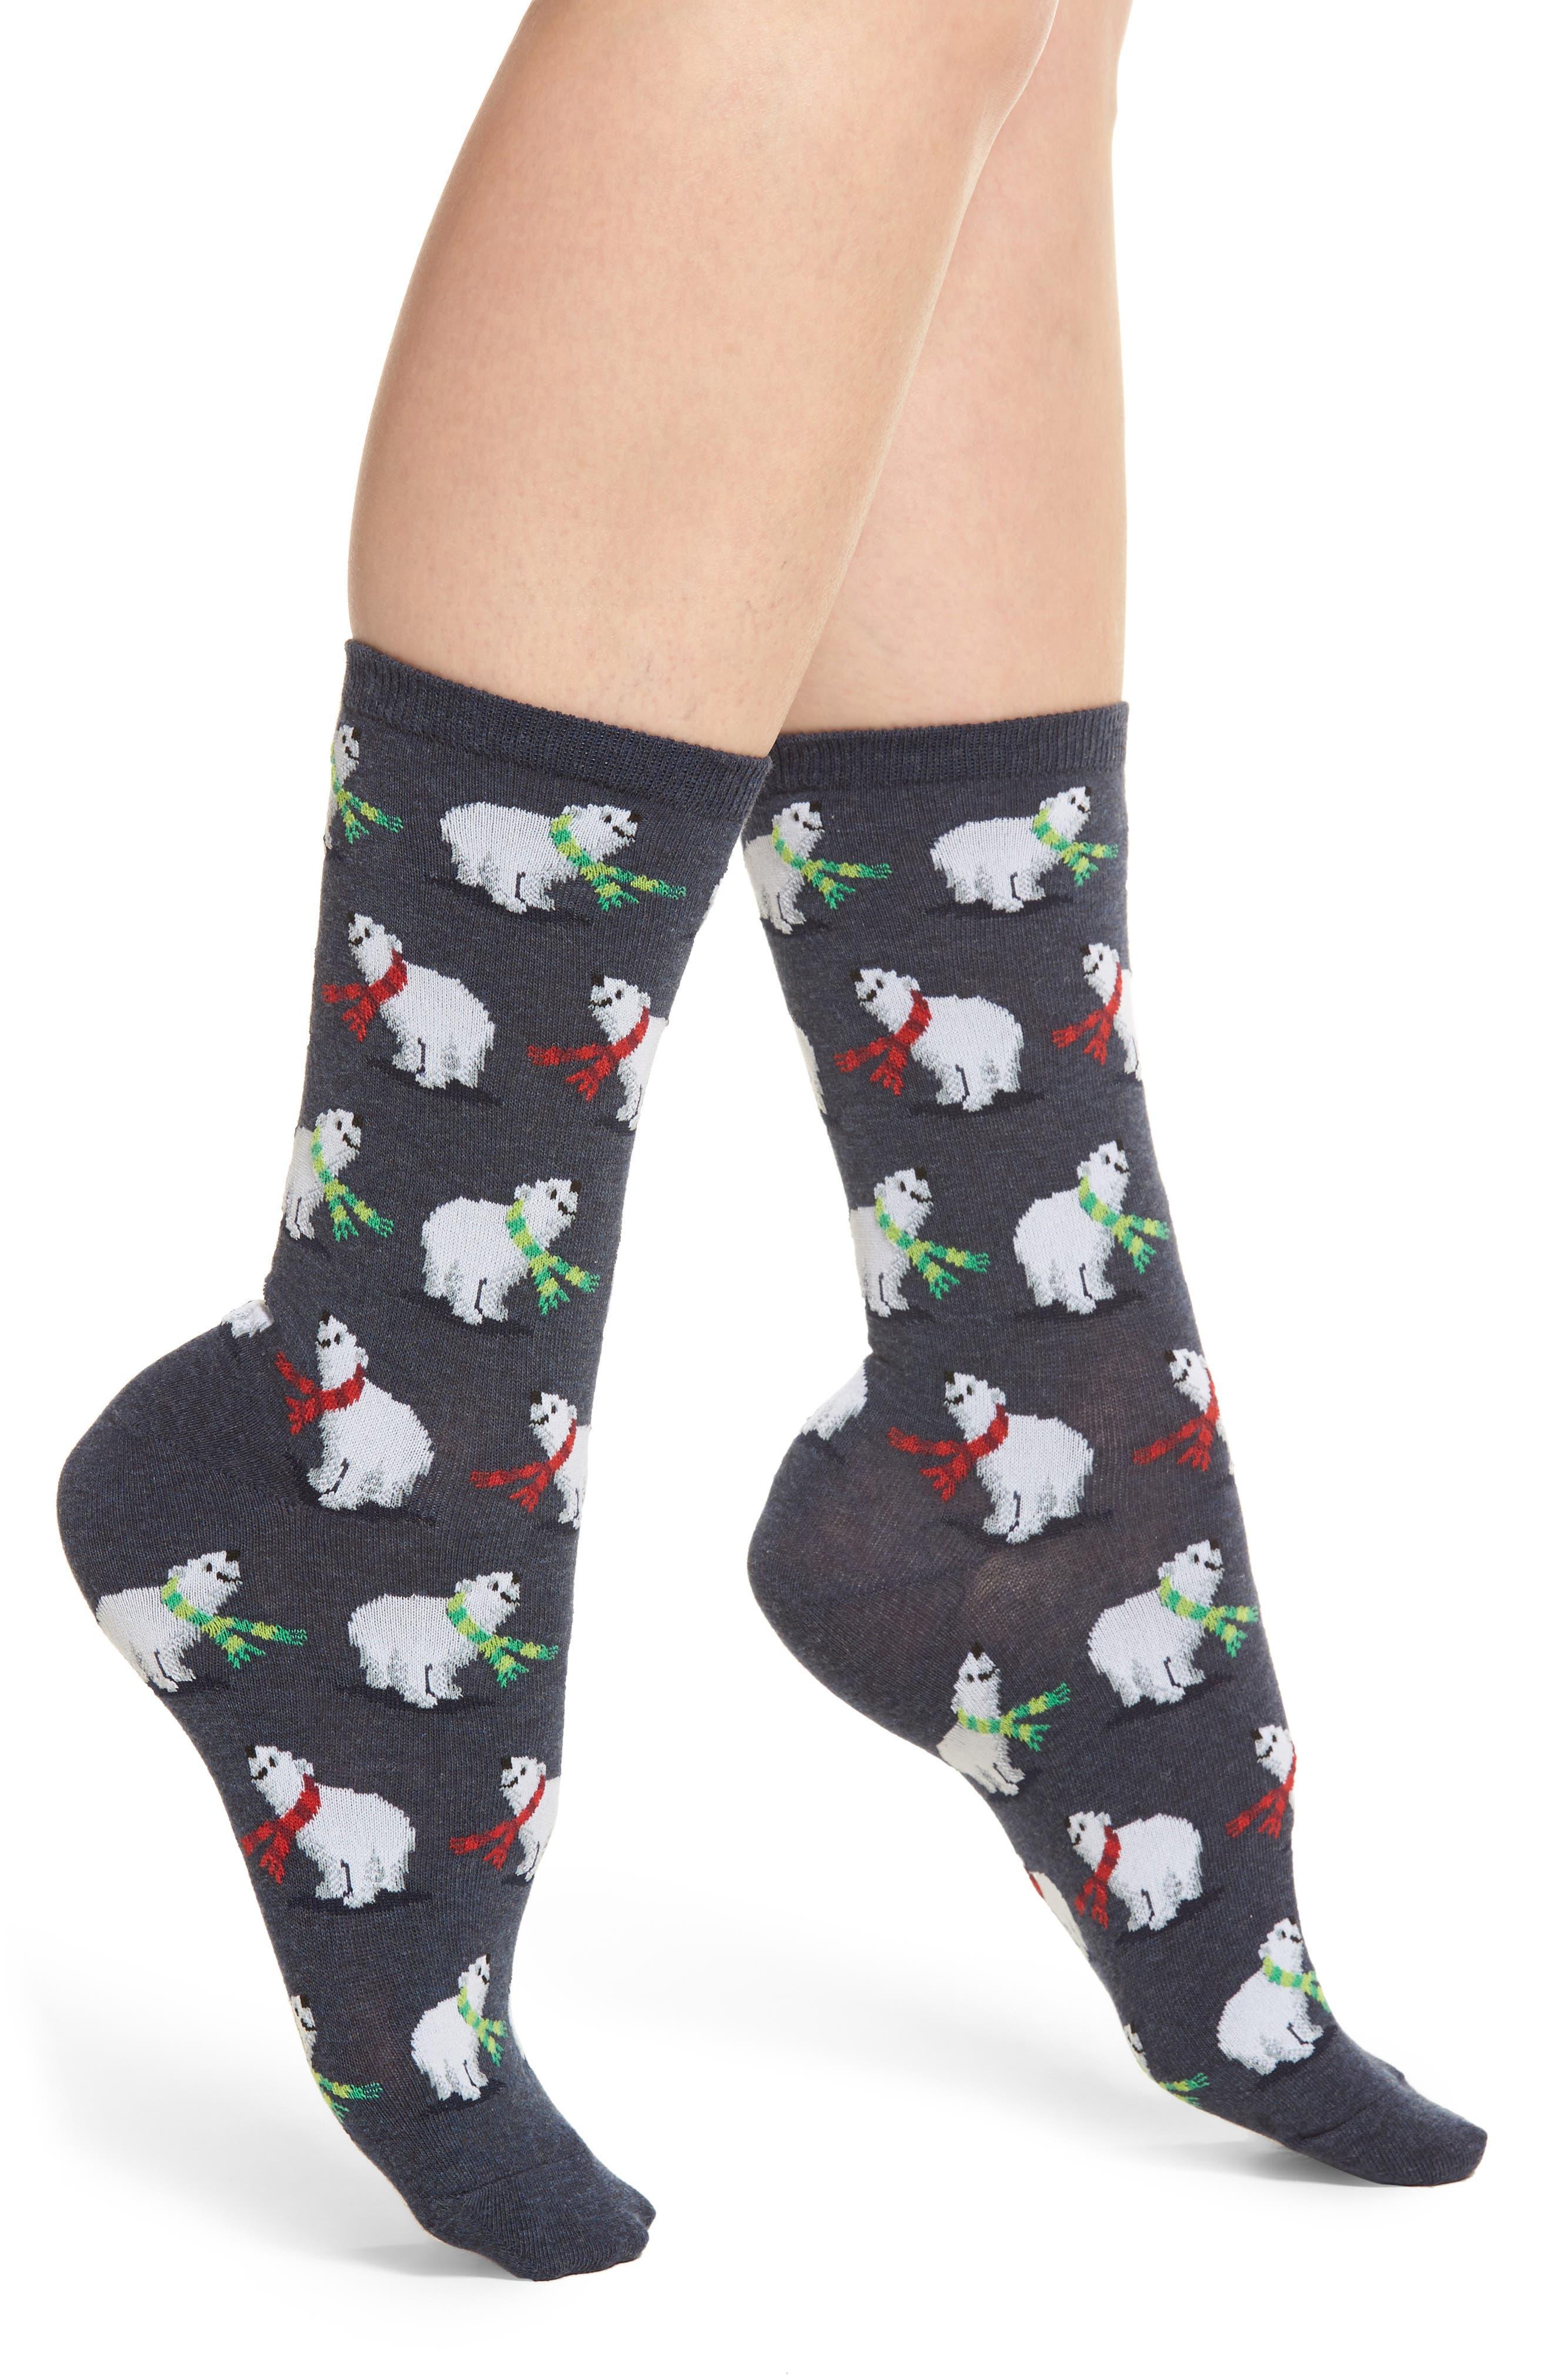 Hot Sox Polar Bears Crew Socks (3 for $15)